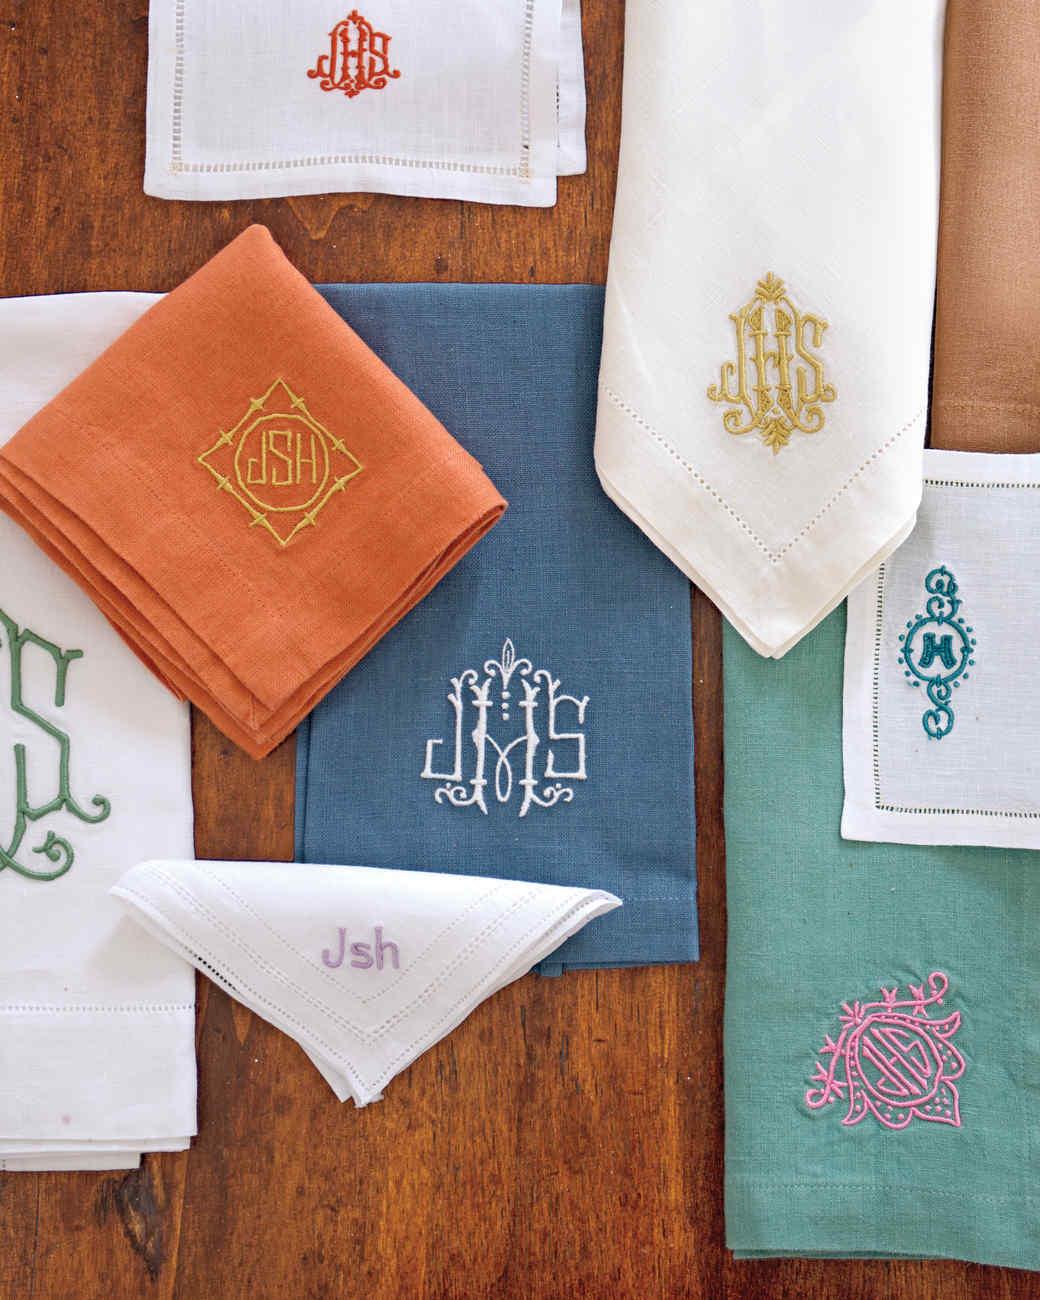 embroidered-handkerchief-fanatic-2-s112584.jpg